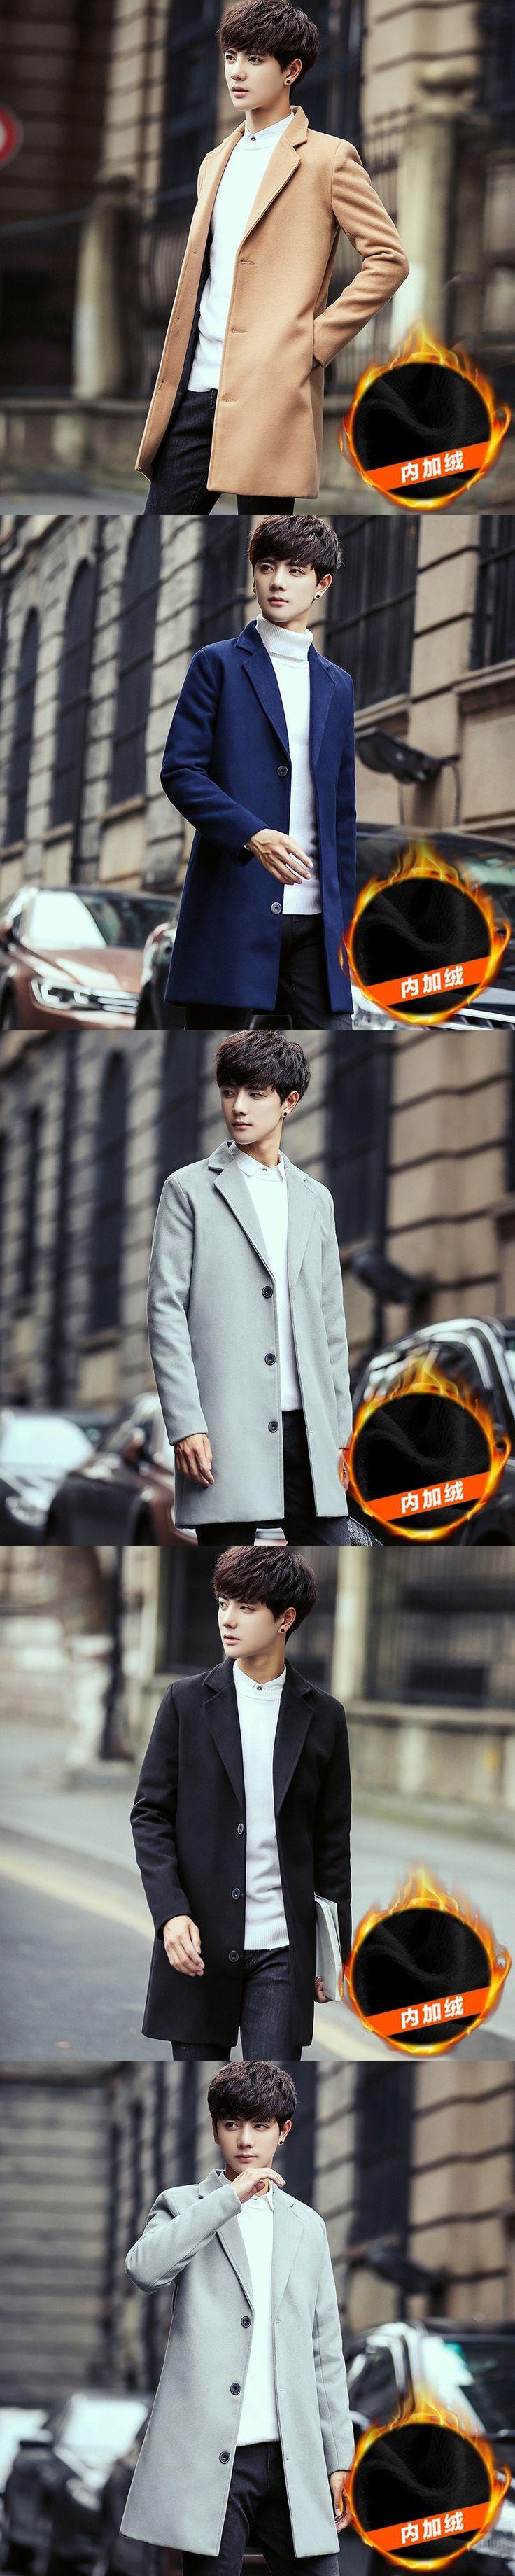 Sapphire Wool Coat Men Shawl Casual Autumn Solid Slim Male Long Raincoat Cardigan Double Button Cloak Woolen Short Man f20+